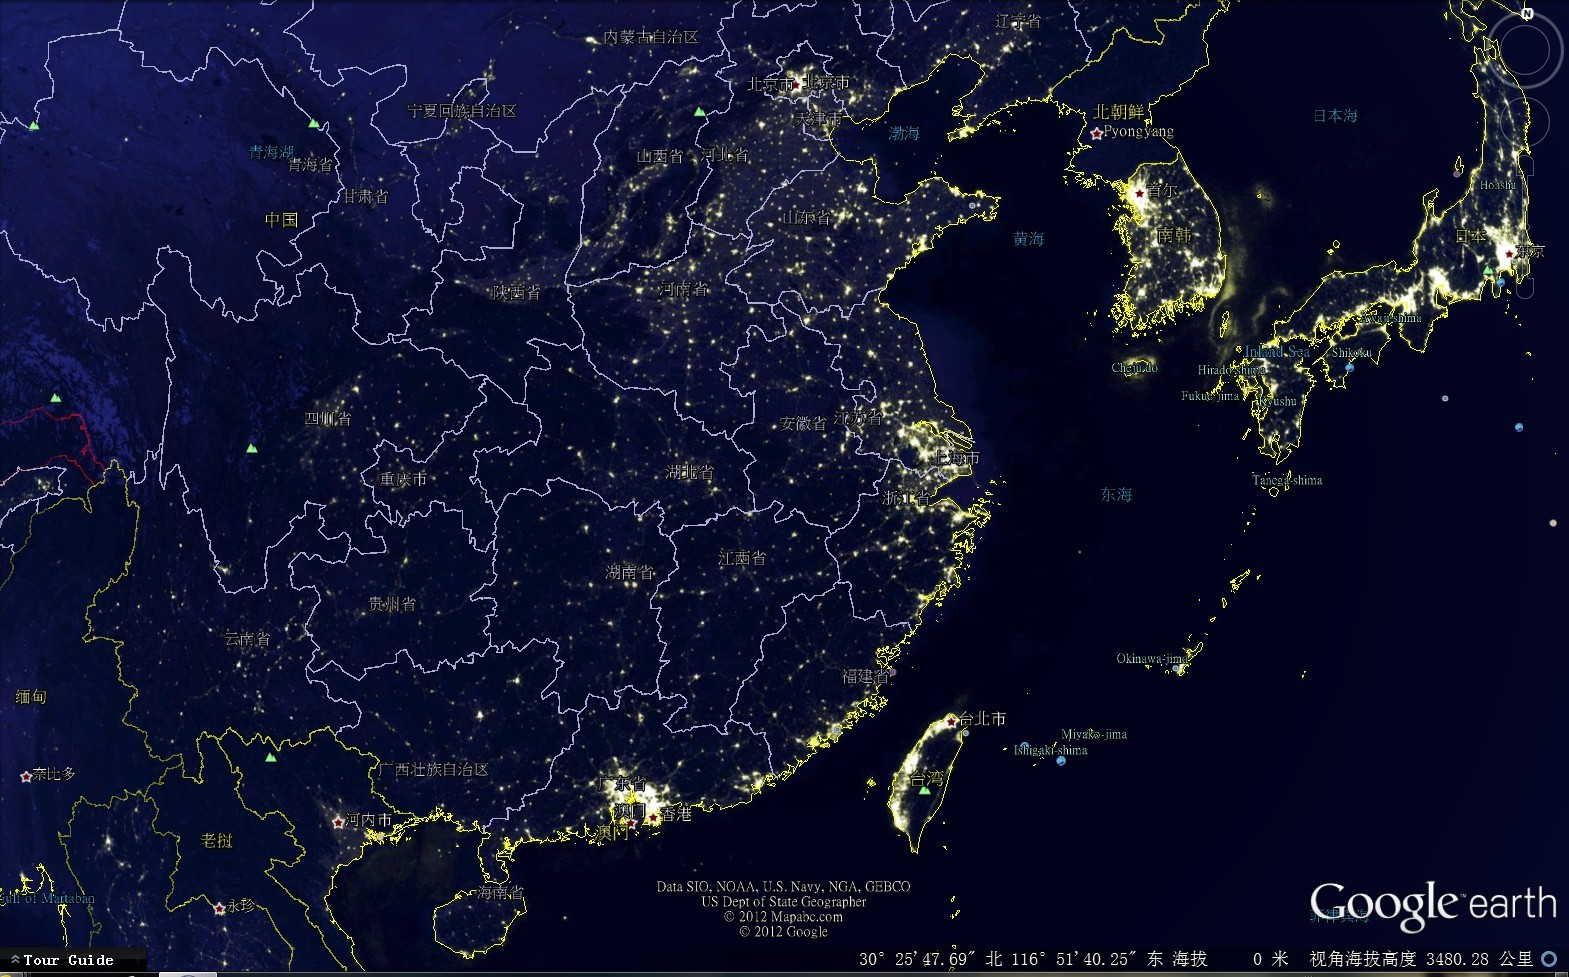 google地球下载_「 谷歌地球 」谷歌地球(google earth)官方版下载